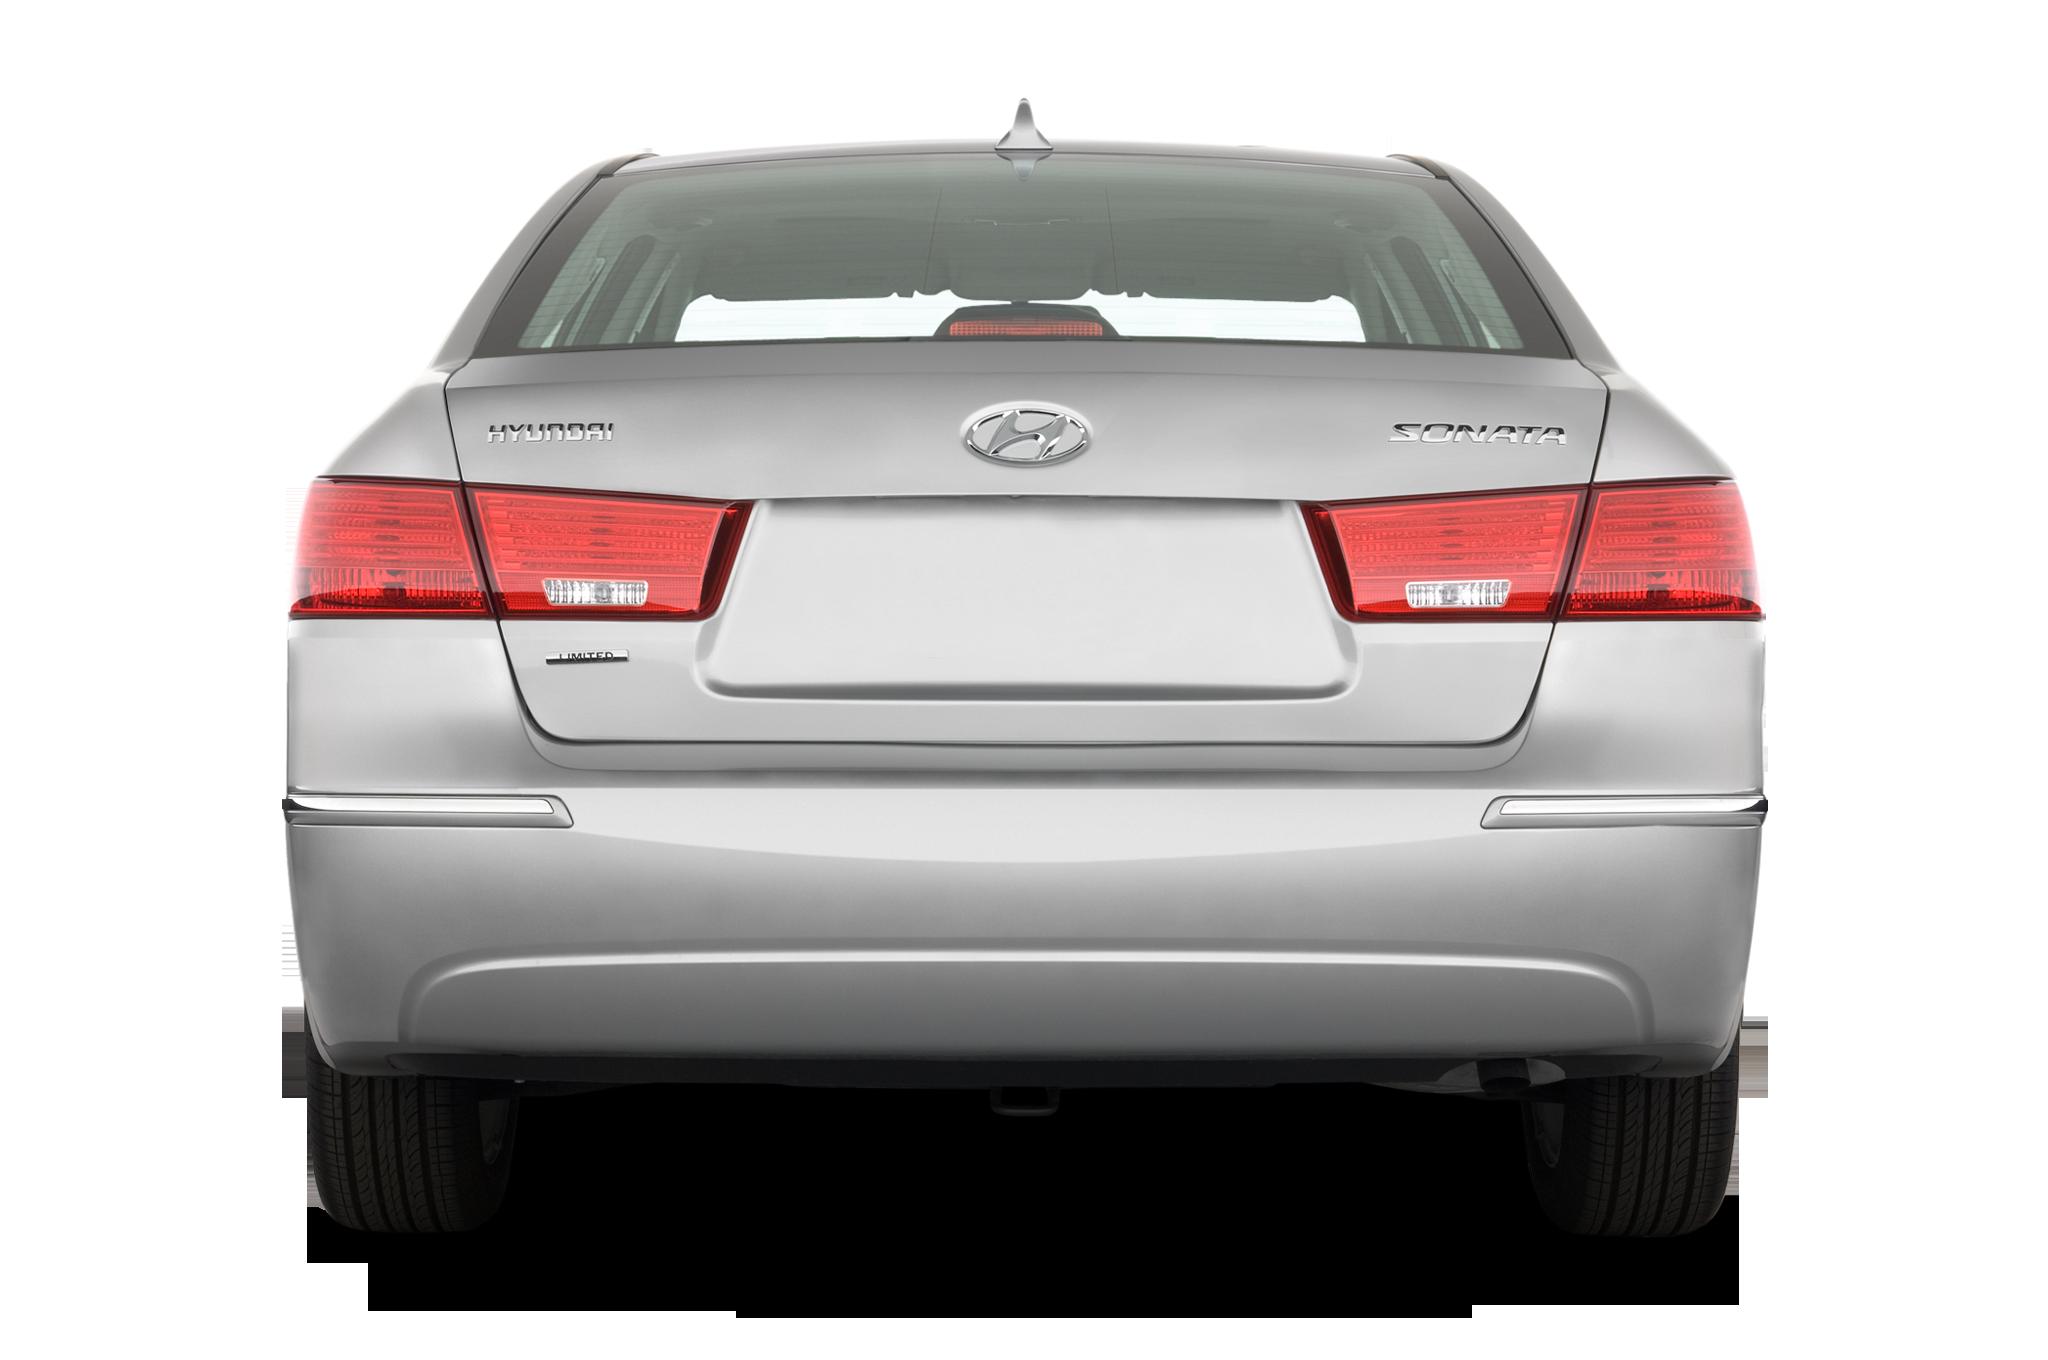 2010 Hyundai Sonata Se Midsize Sedan Review Automobile Engine Diagram 7 25